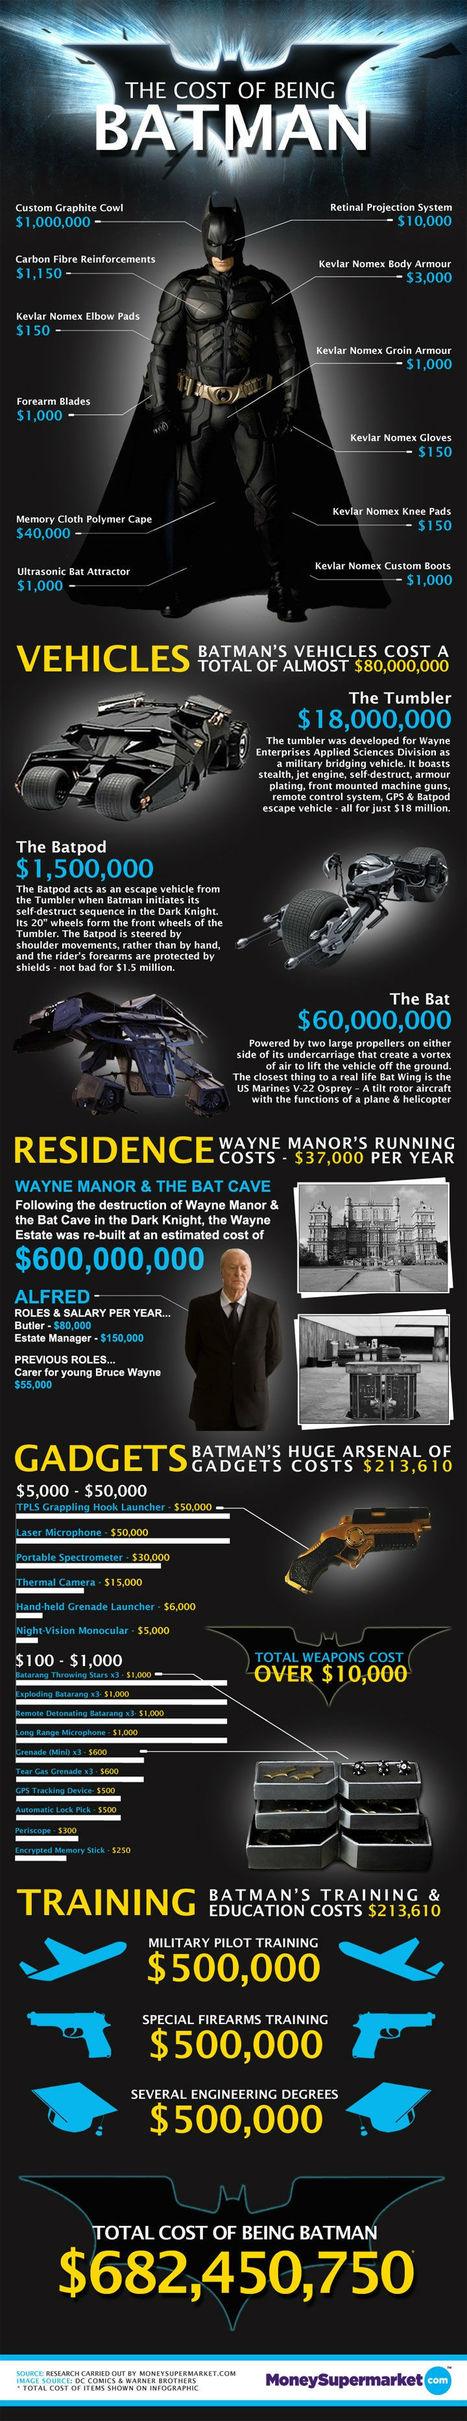 How Much Would It Cost To BeBatman? | Digital Media | Scoop.it